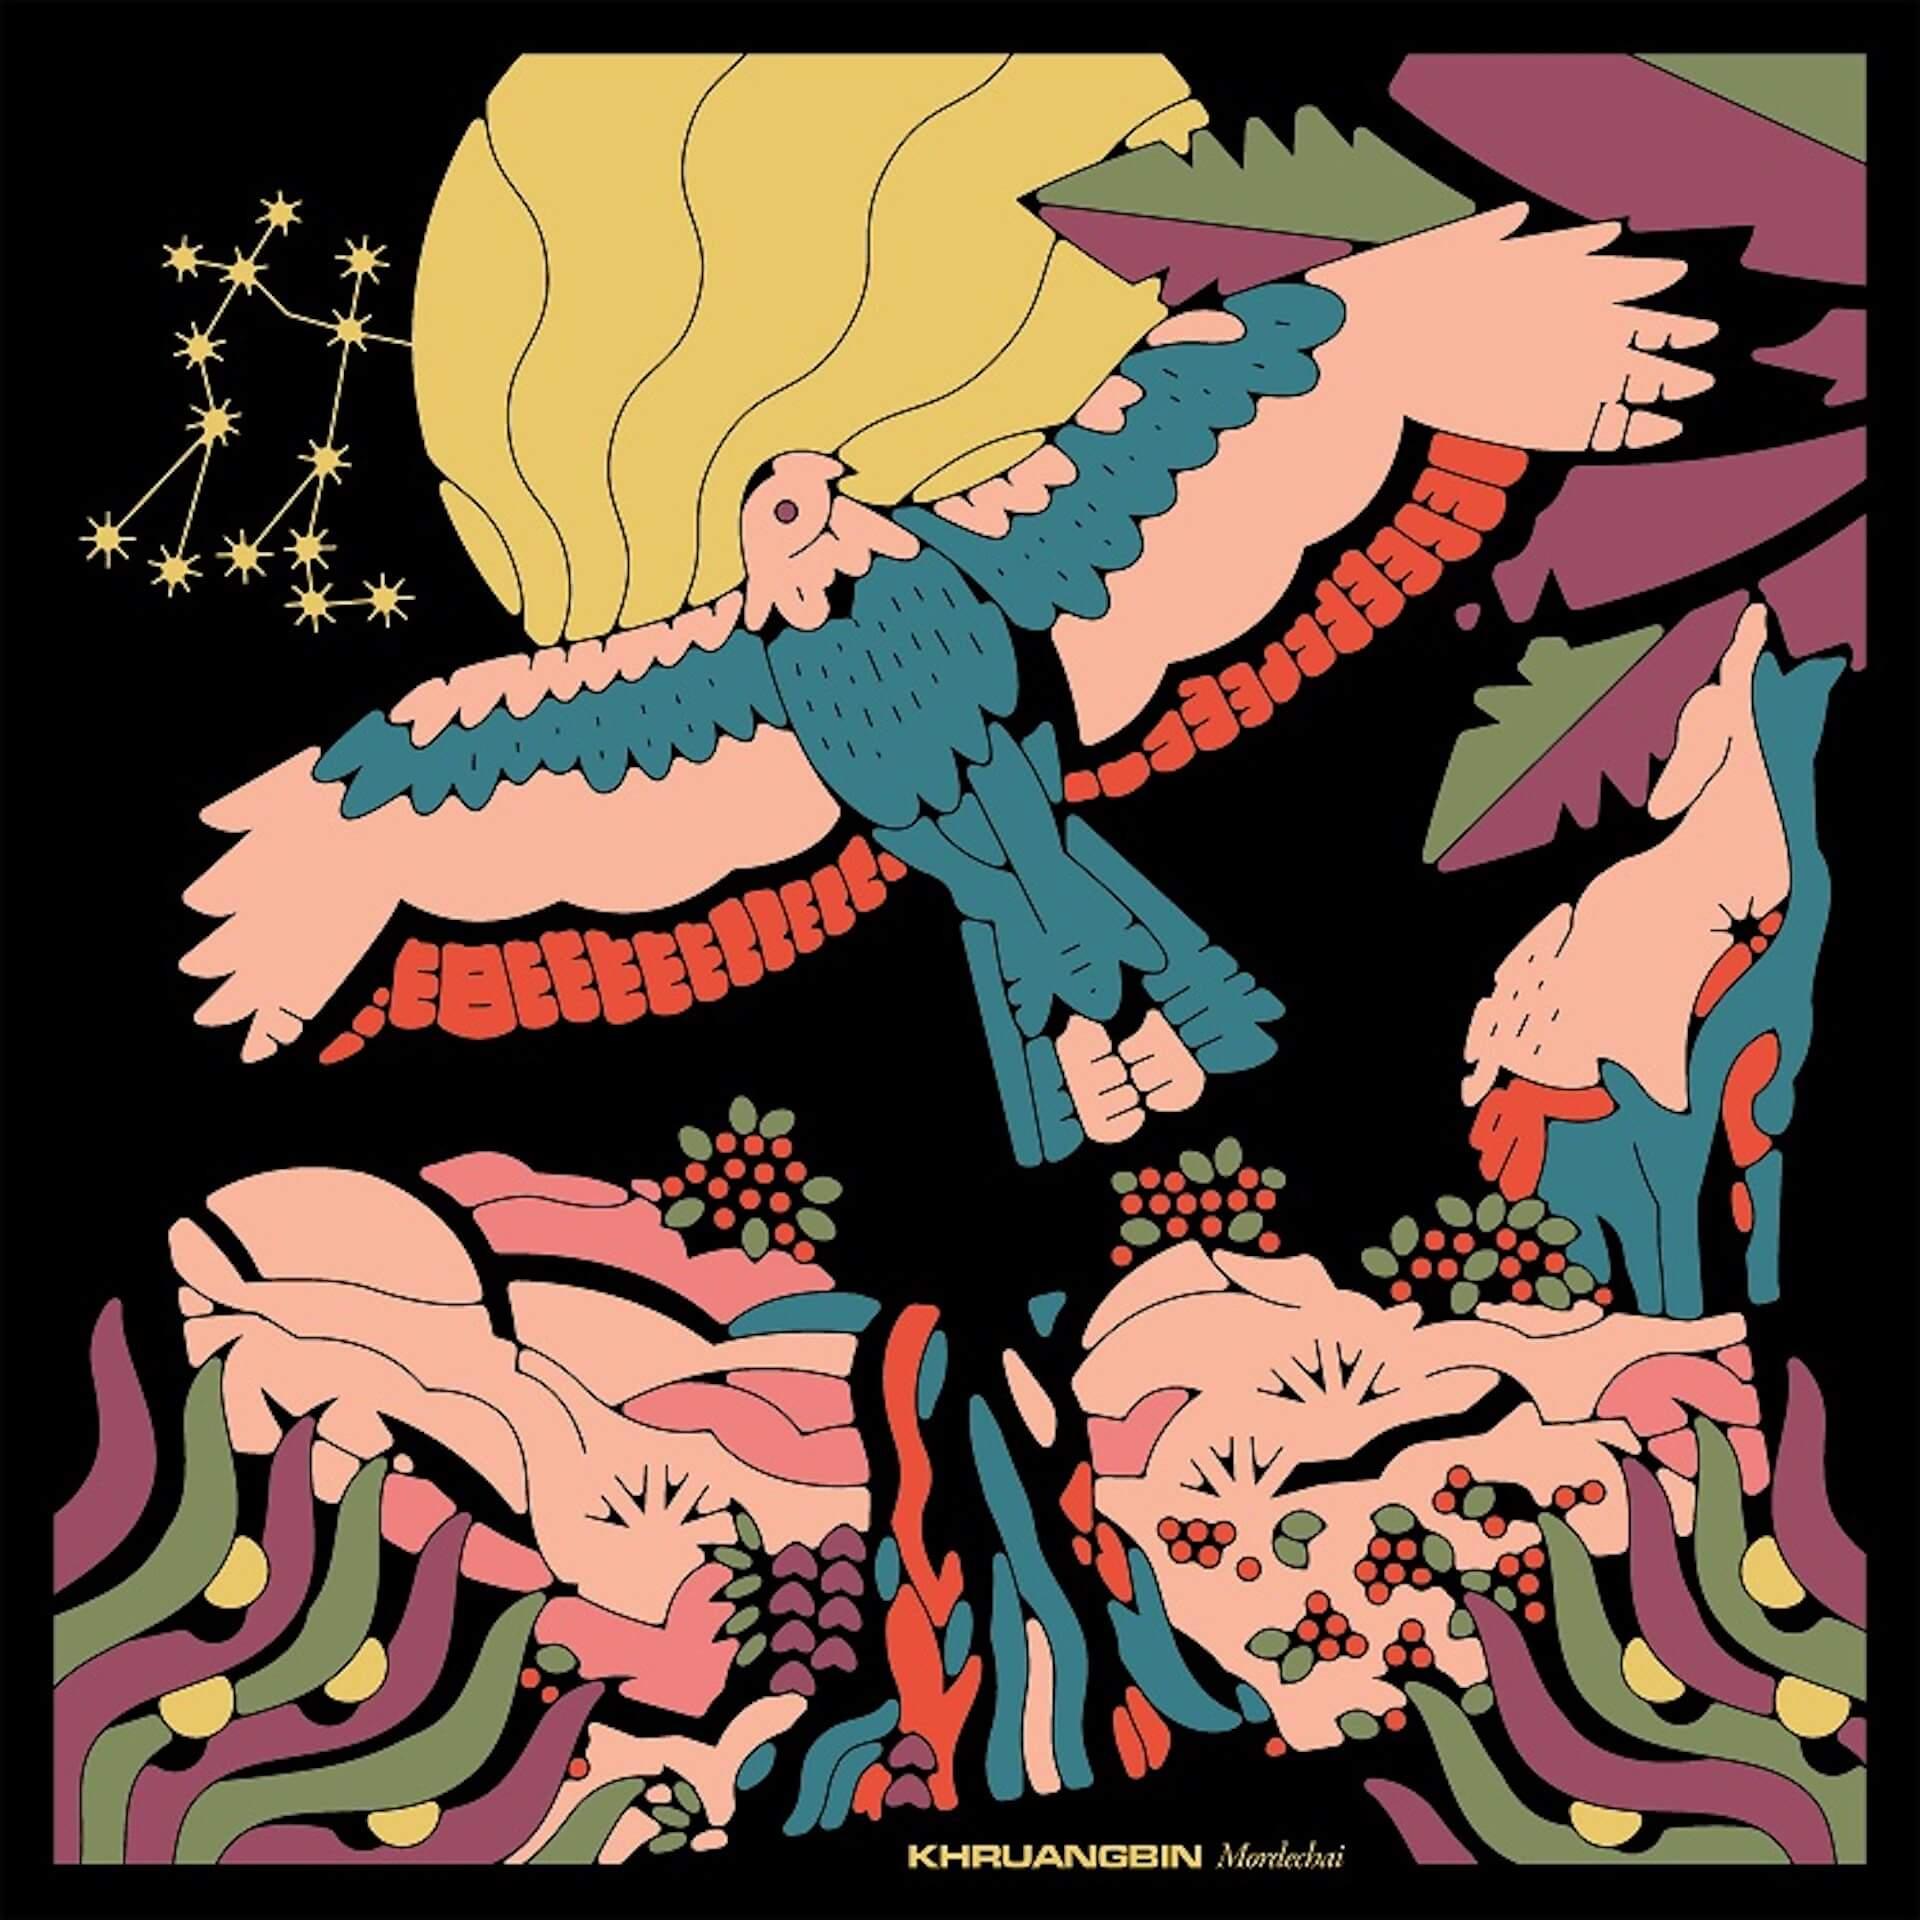 "Khruangbinが新たなフェーズへ!2年ぶりのサードアルバム『Mordechai』が世界同時リリース|収録曲 ""Time(You and I)""のMVも公開 music200428_khruangbin_1"